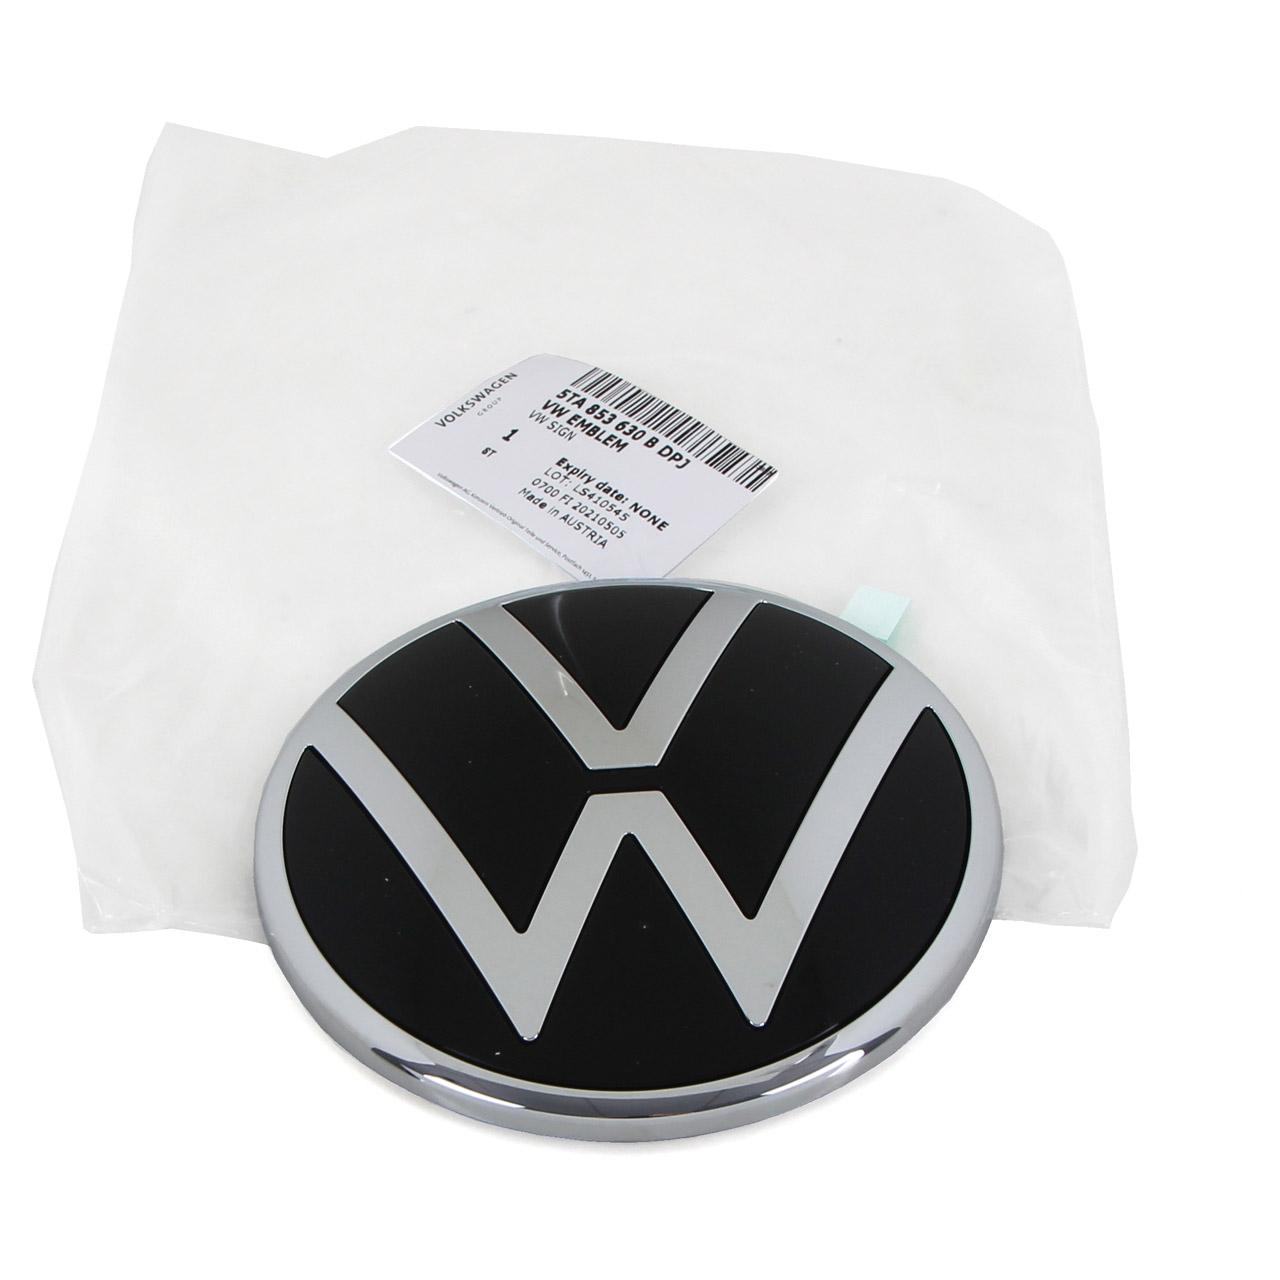 ORIGINAL VW Emblem Logo Plakette Heckklappe Chrom Schwarz Touran 5T 5TA853630B DPJ